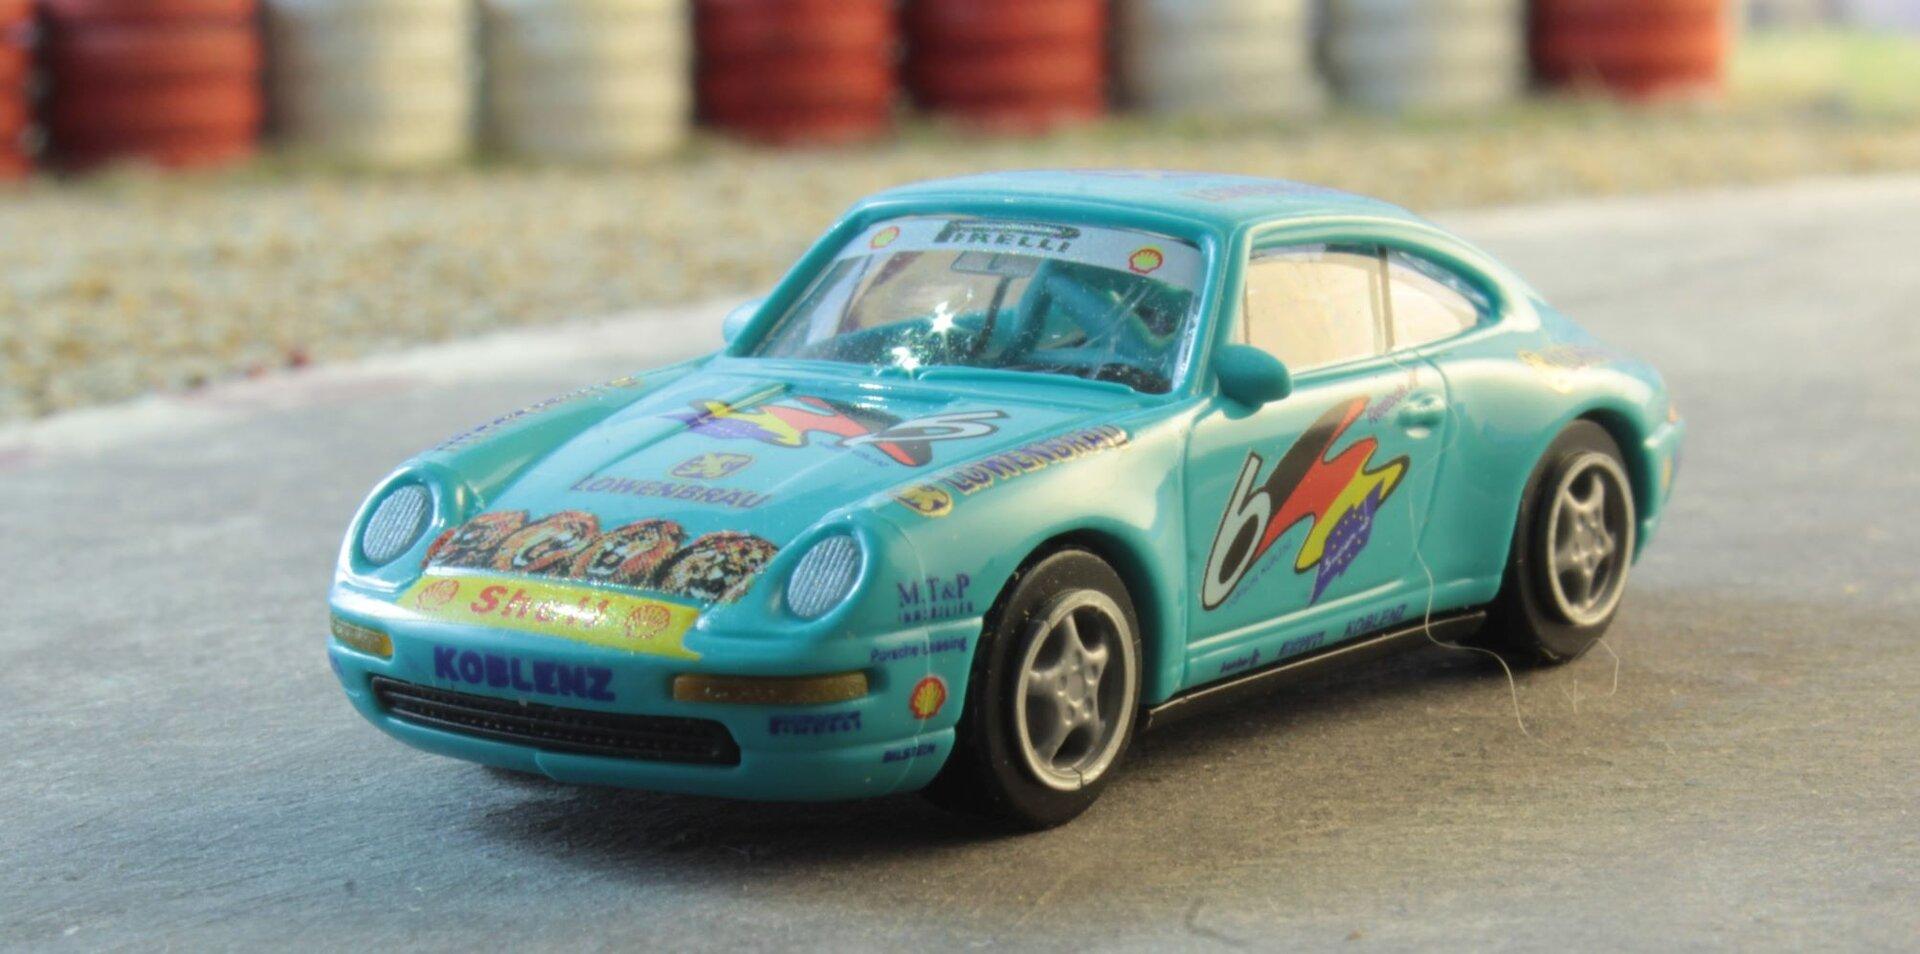 Porsche 911 Koblenz nr6 Euromodel 3 .JPG